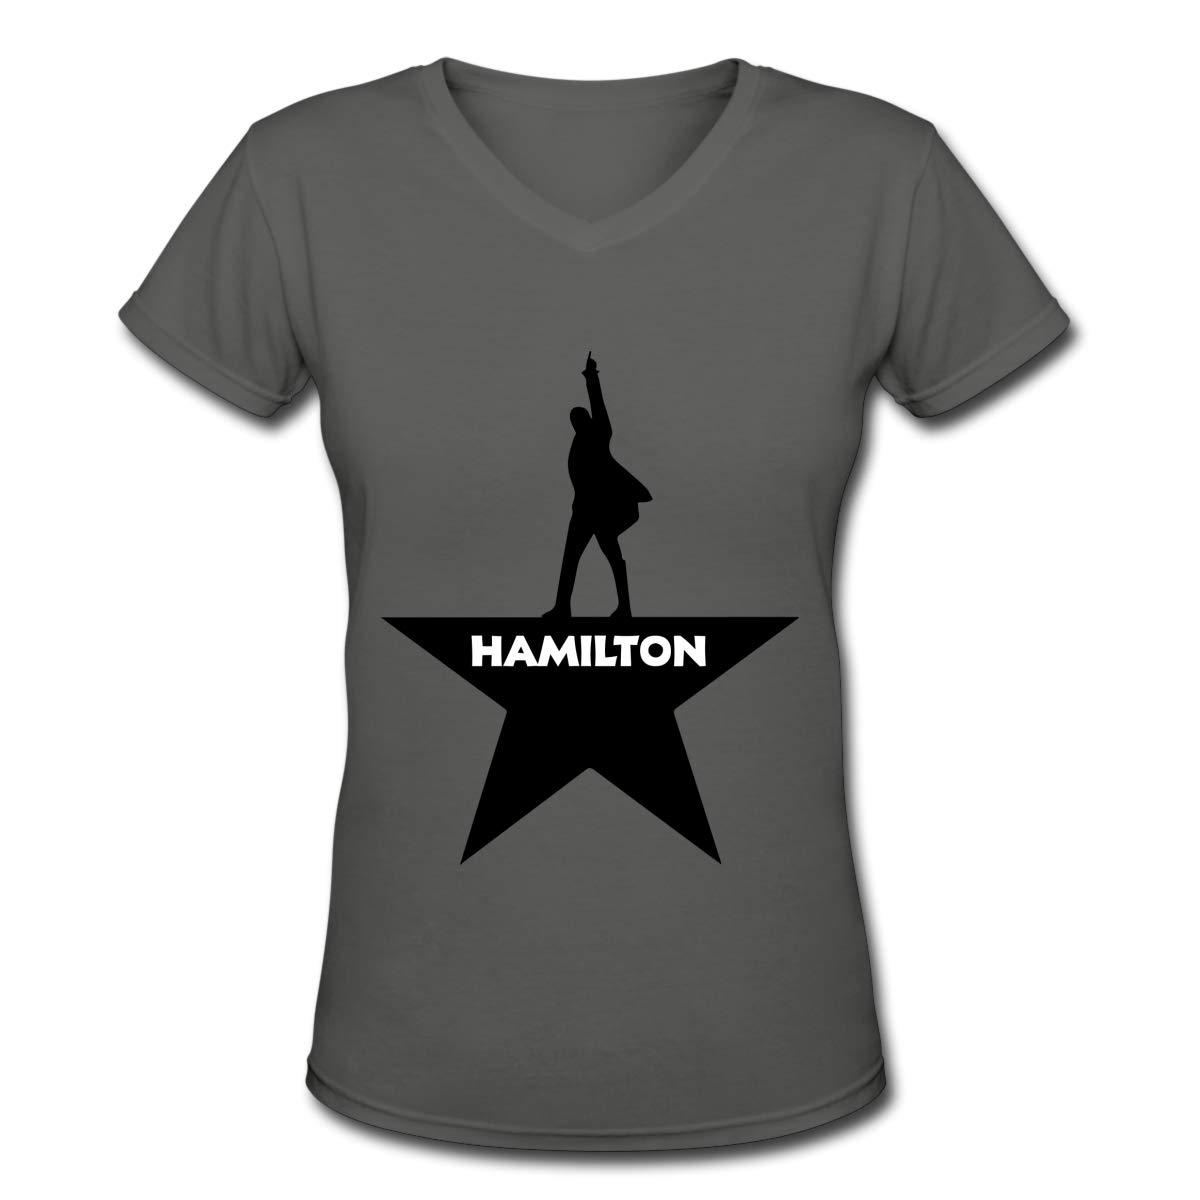 Hamilton The Musical Womens Short-Sleeve V Neck Basic T Shirt Tops